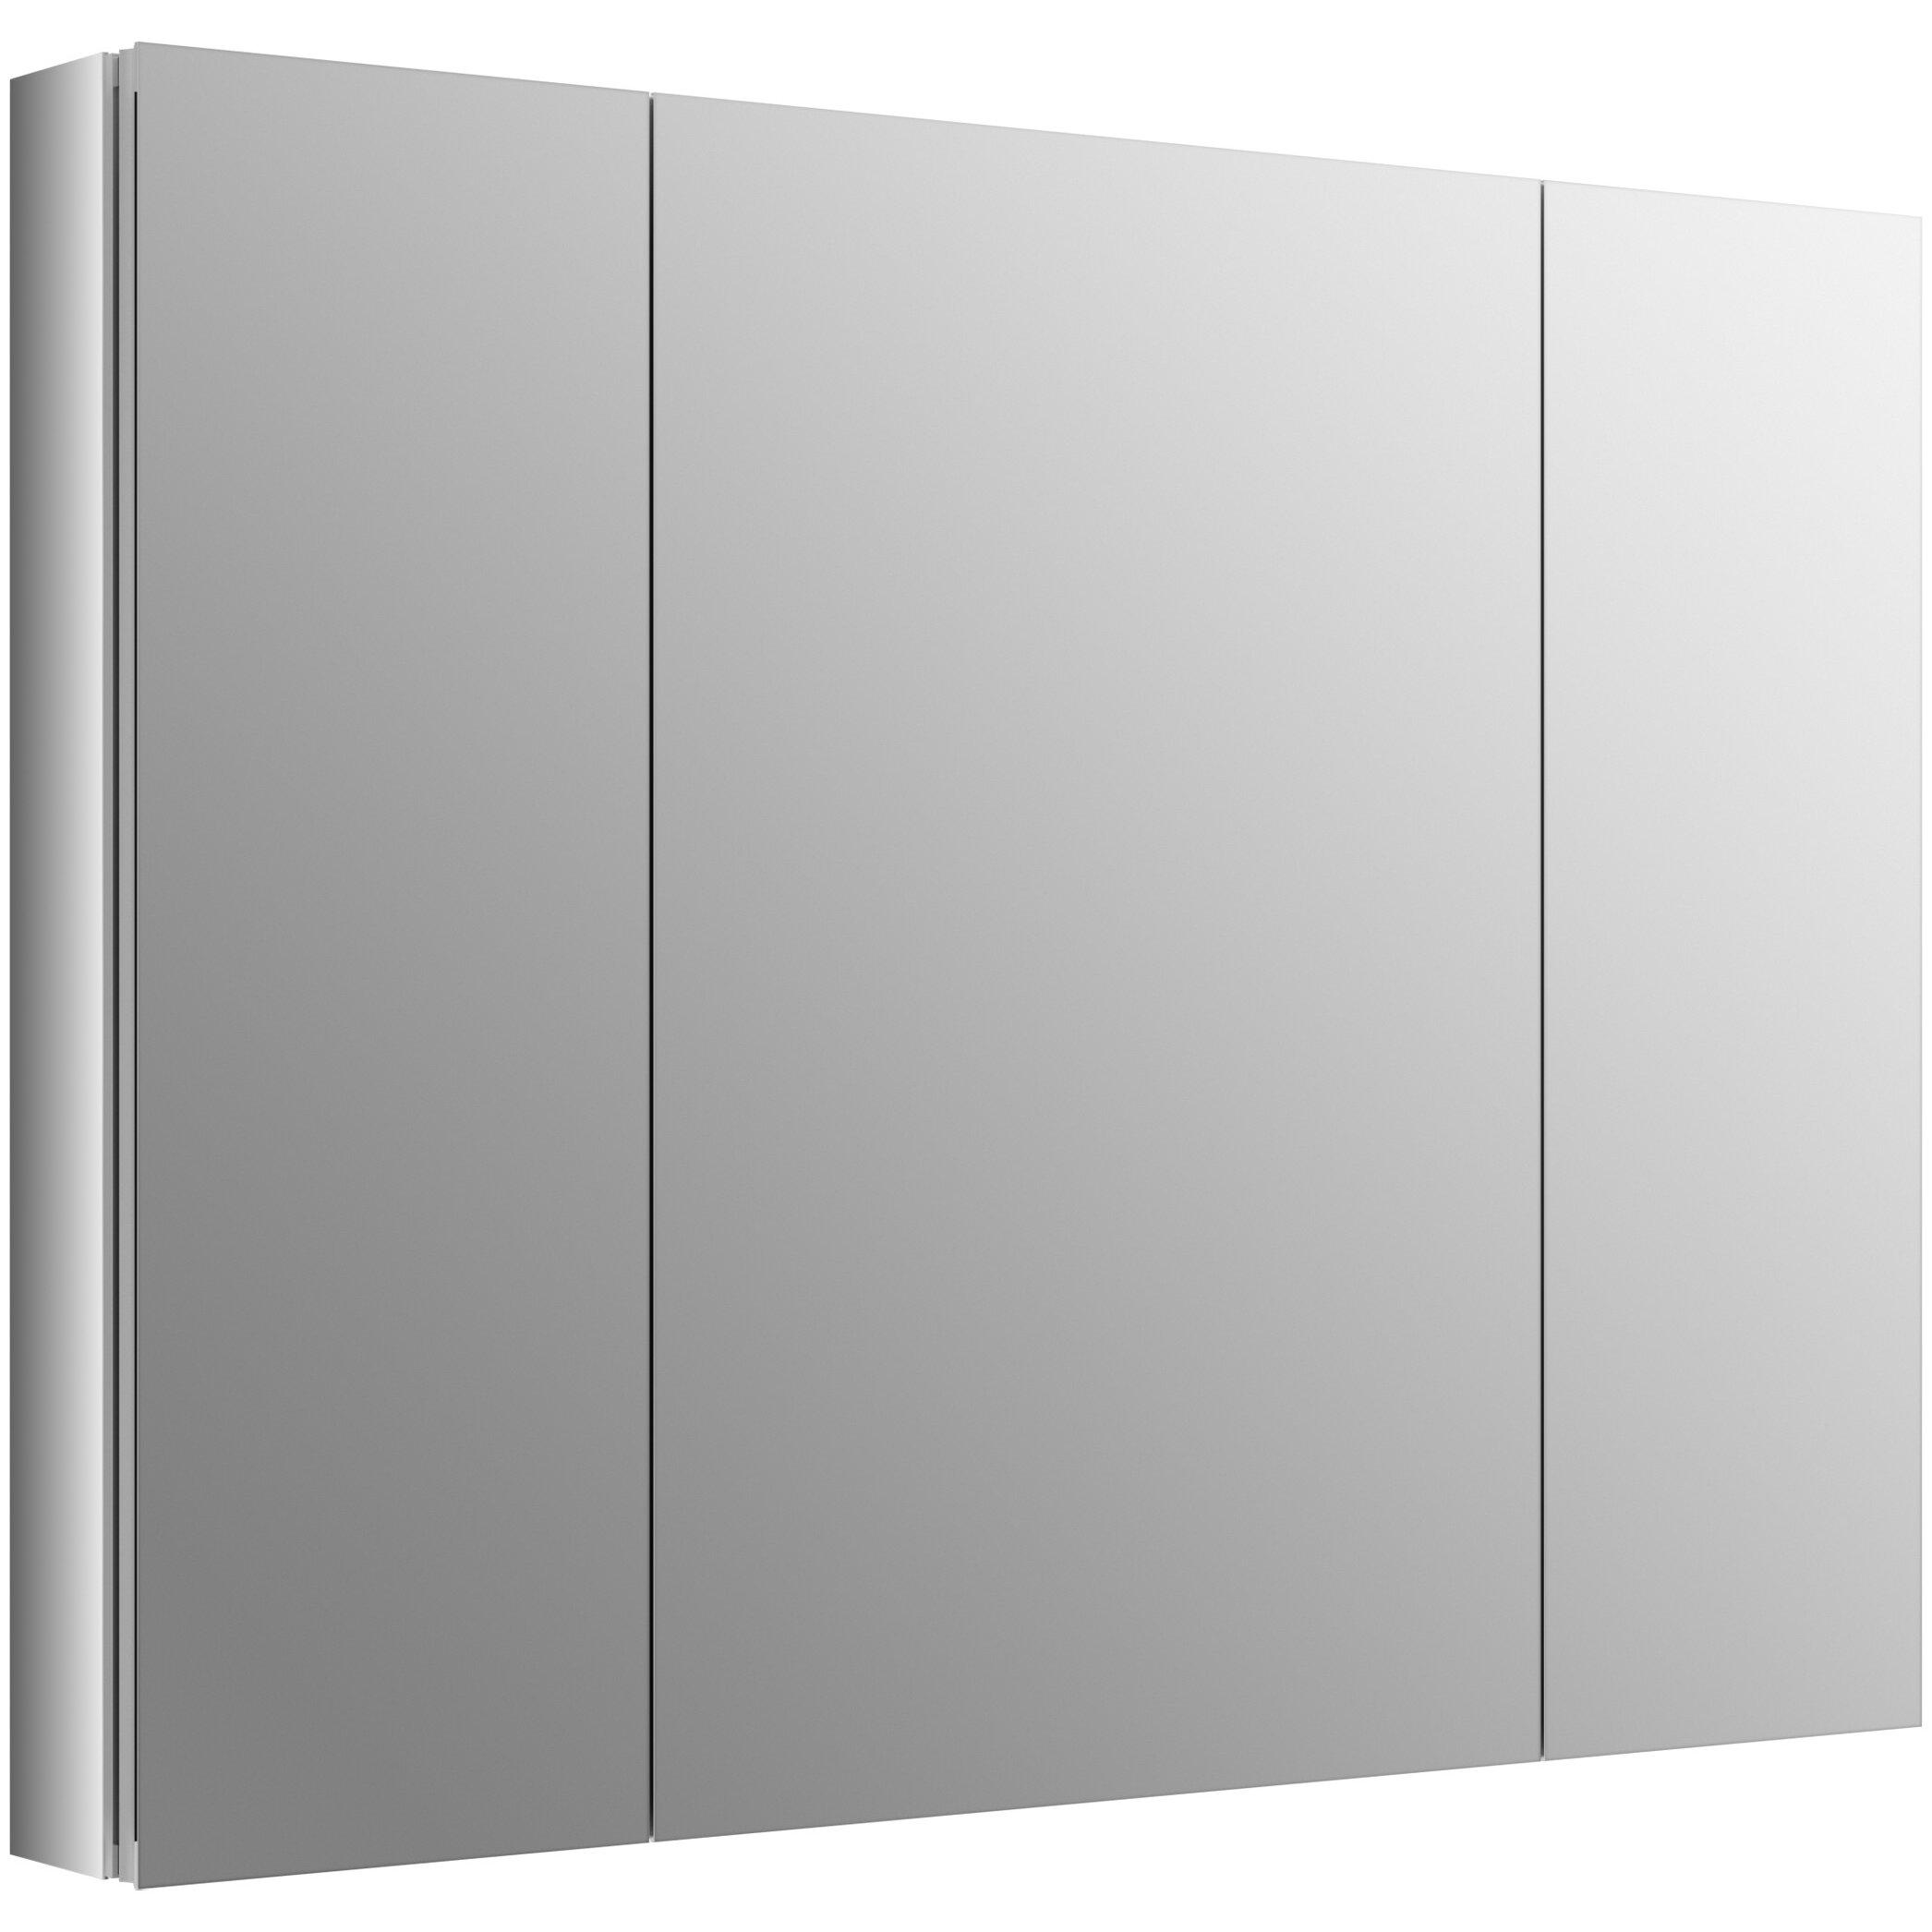 30 X 30 Medicine Cabinet Kohler Verdera 40 W X 30 H Aluminum Medicine Cabinet With